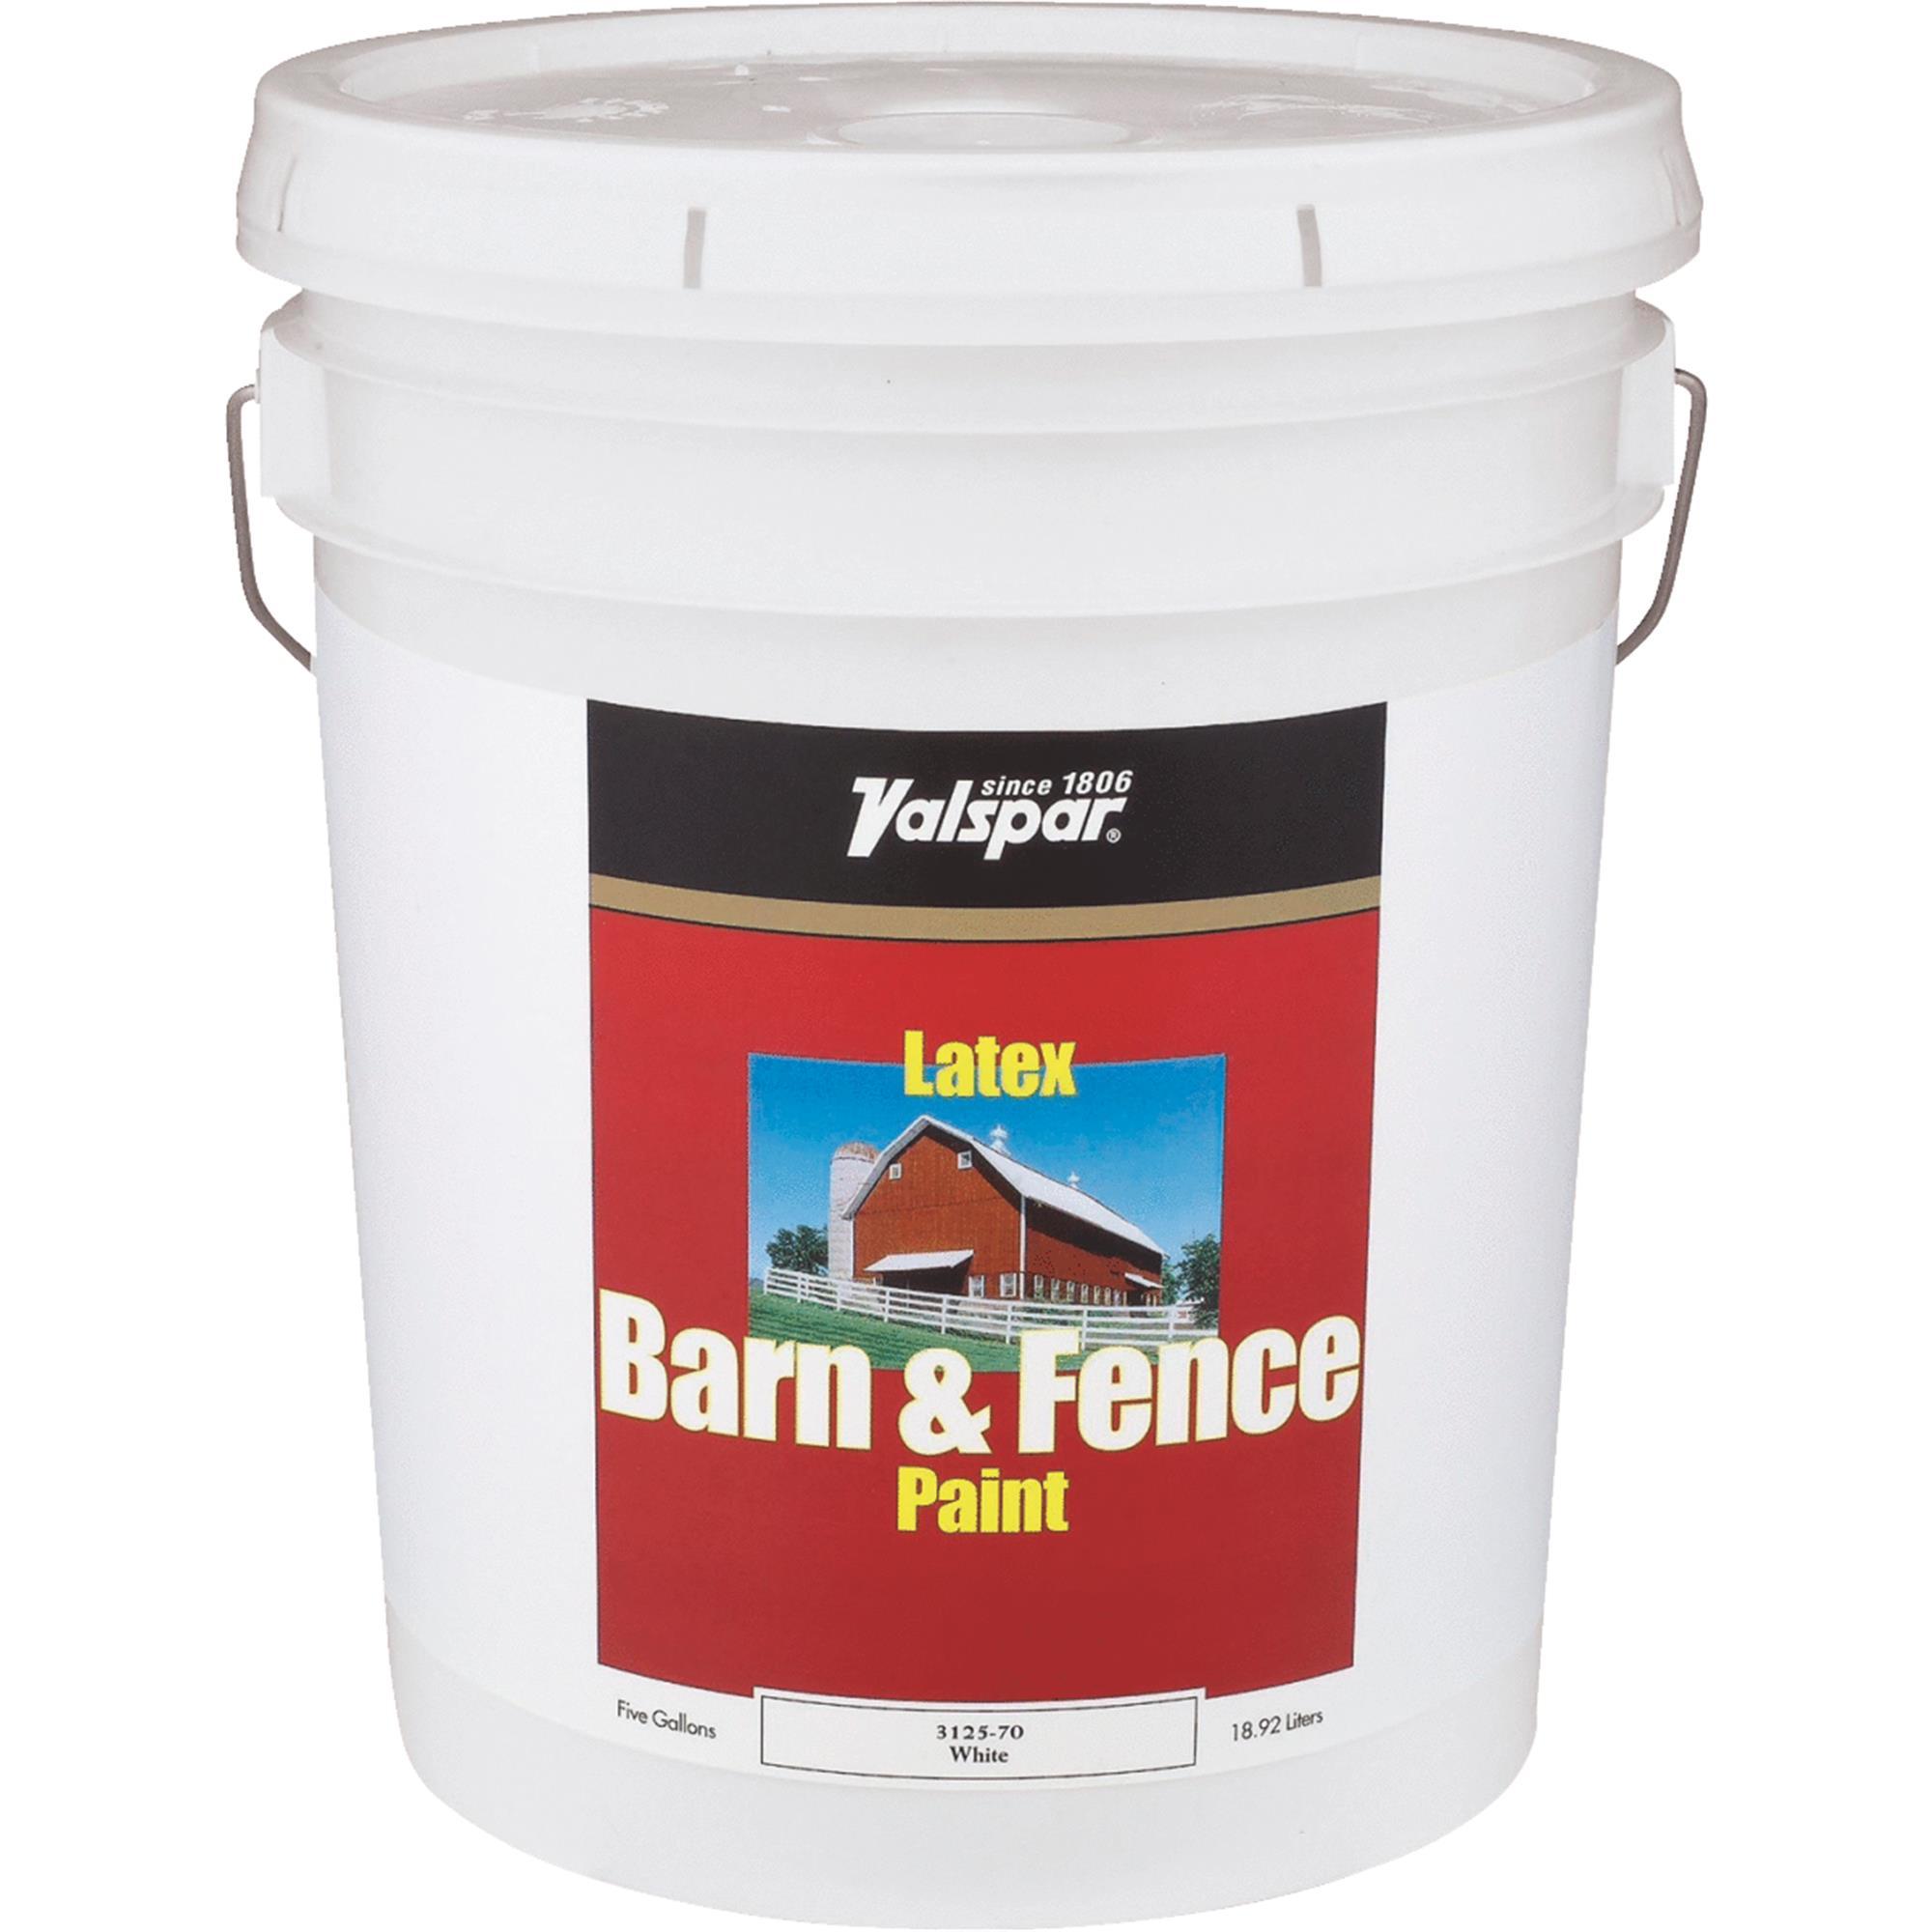 Valspar Valspar Farm And Ranch Latex Paint - Walmart.com ...